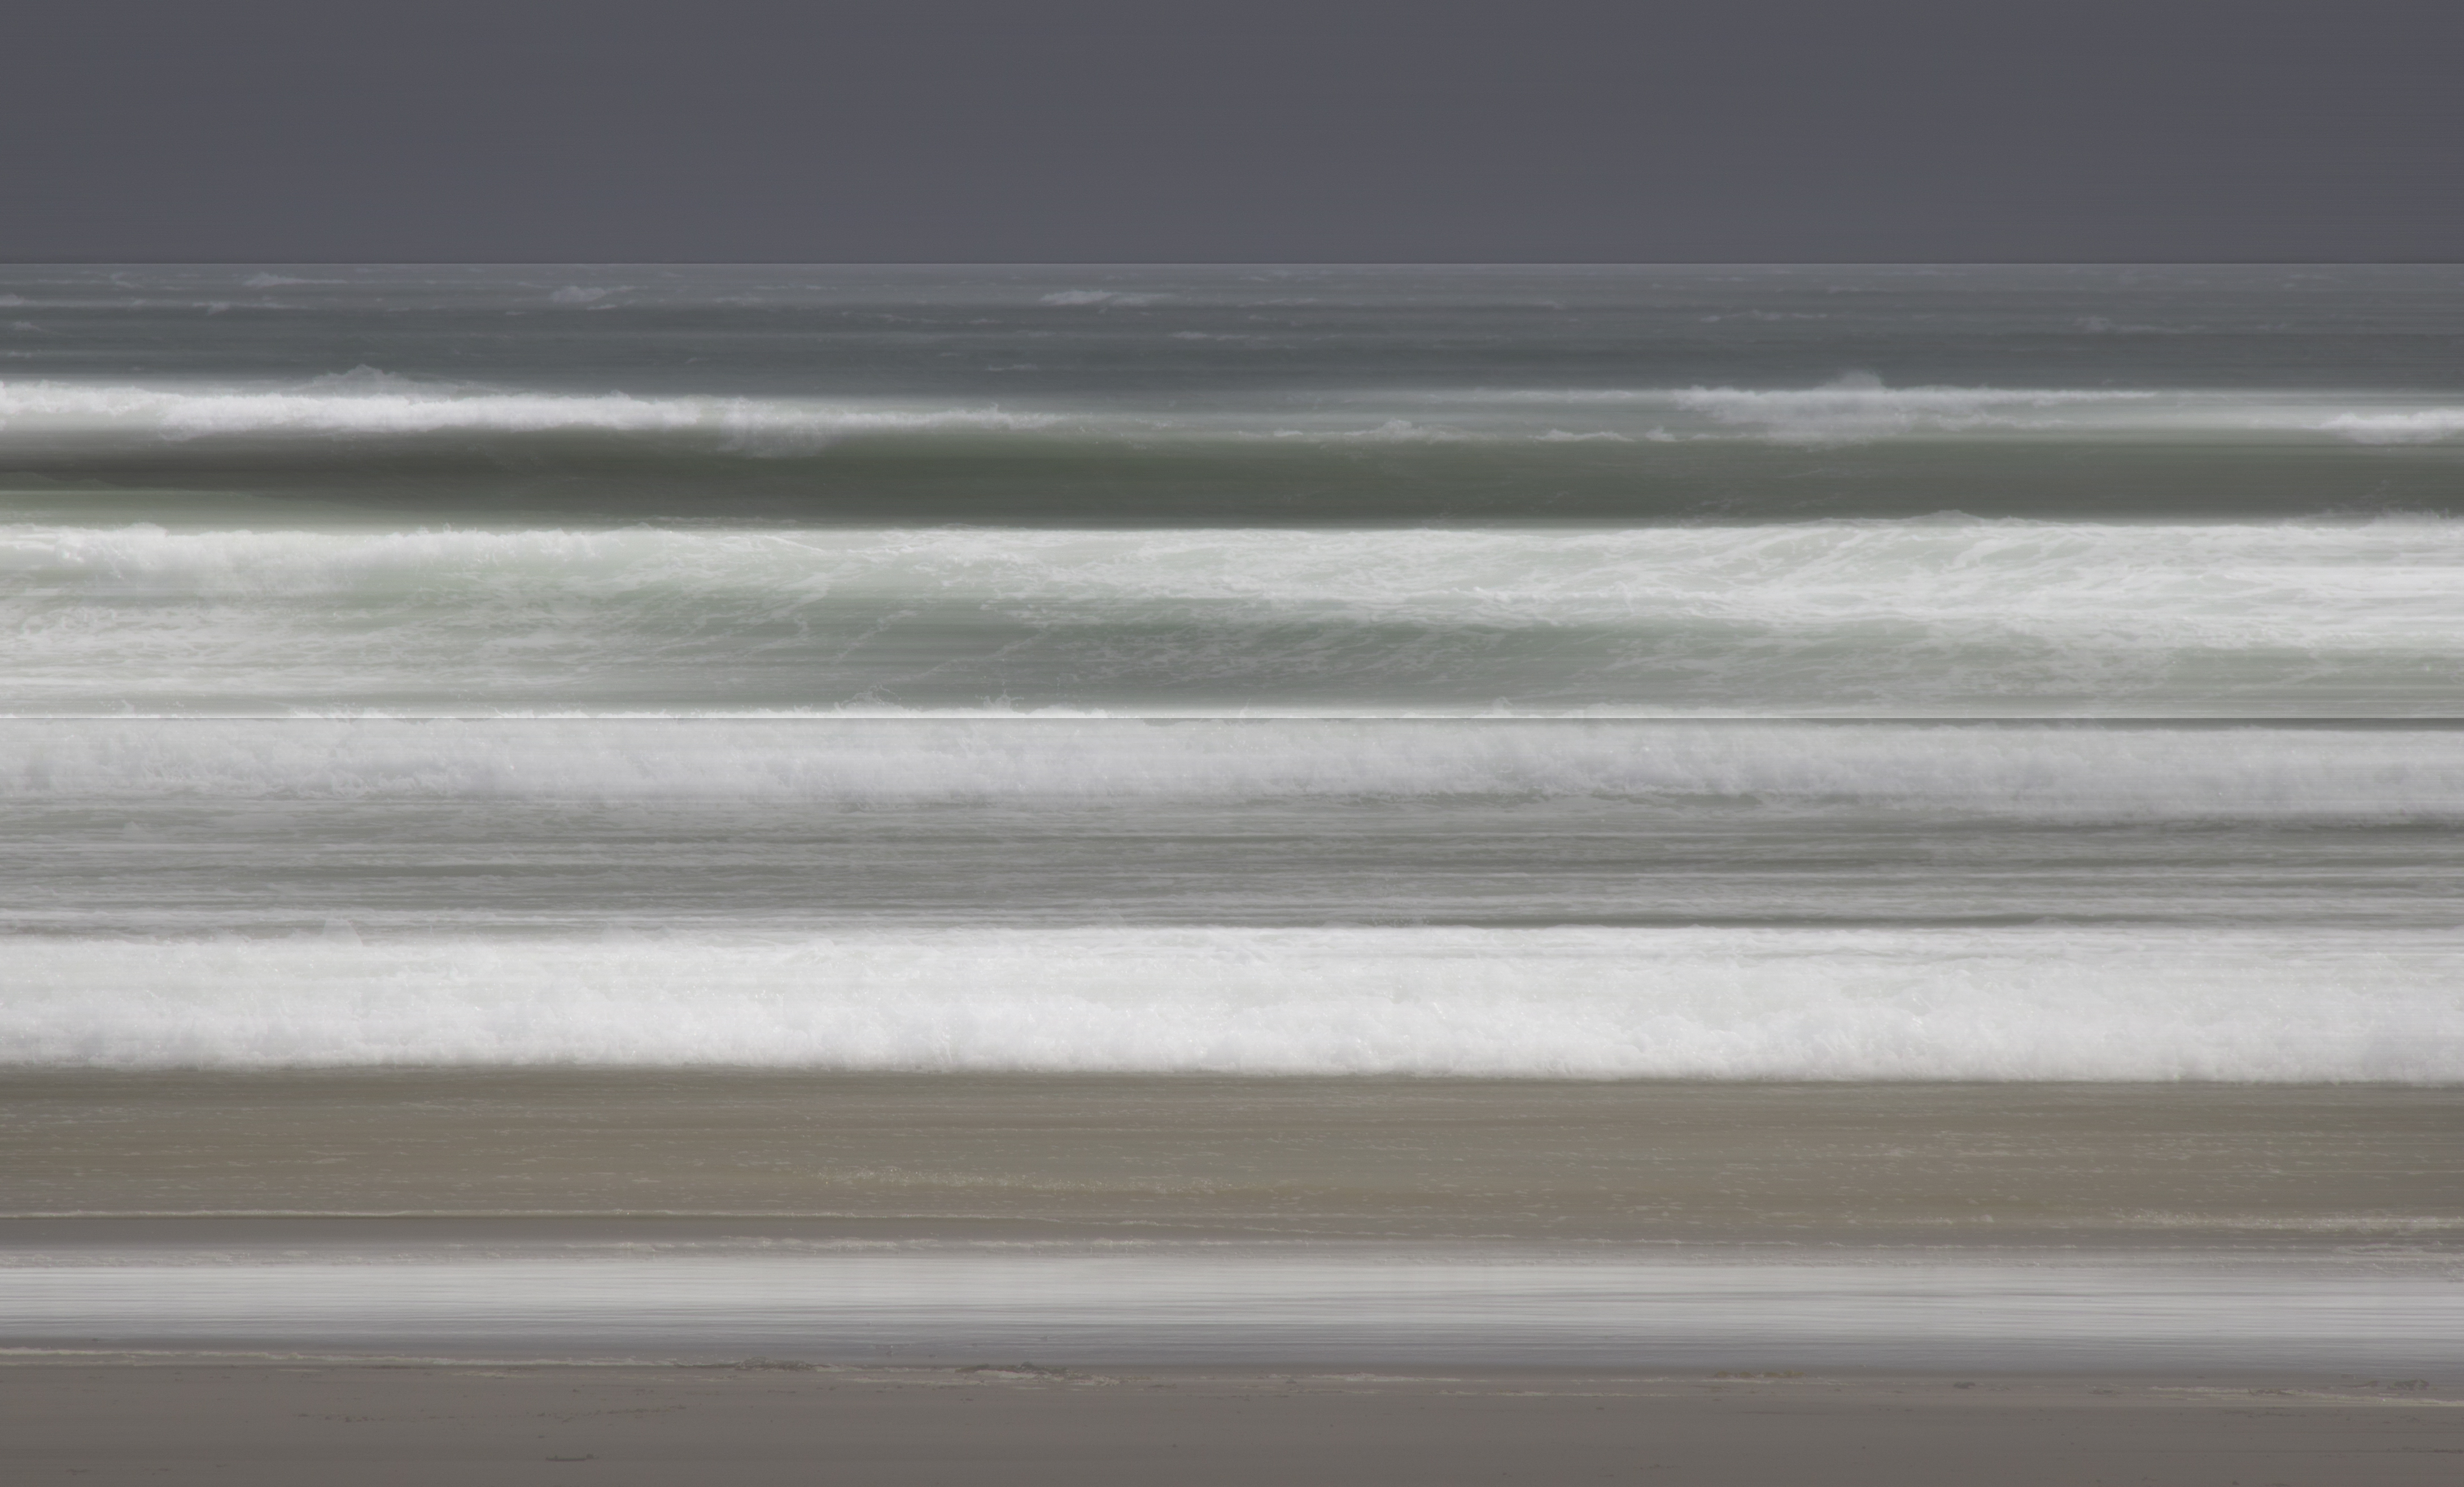 Shore Lines 9